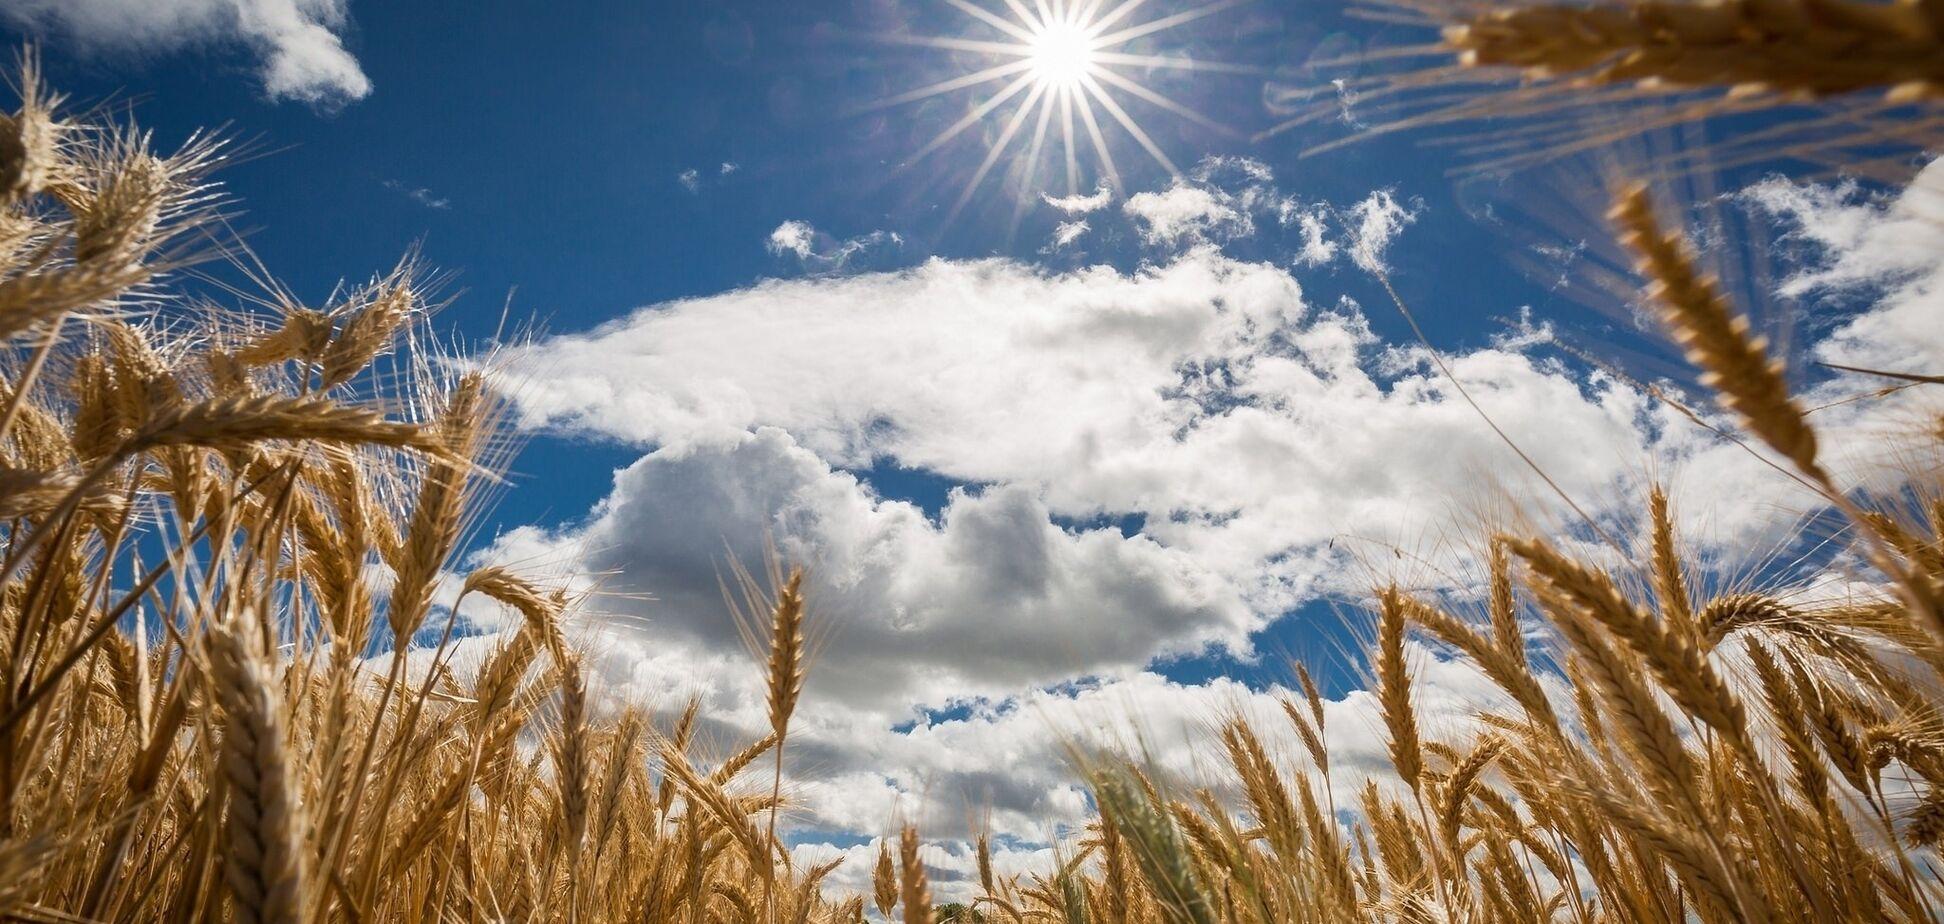 'Не будет жарким': народный синоптик дал прогноз на лето